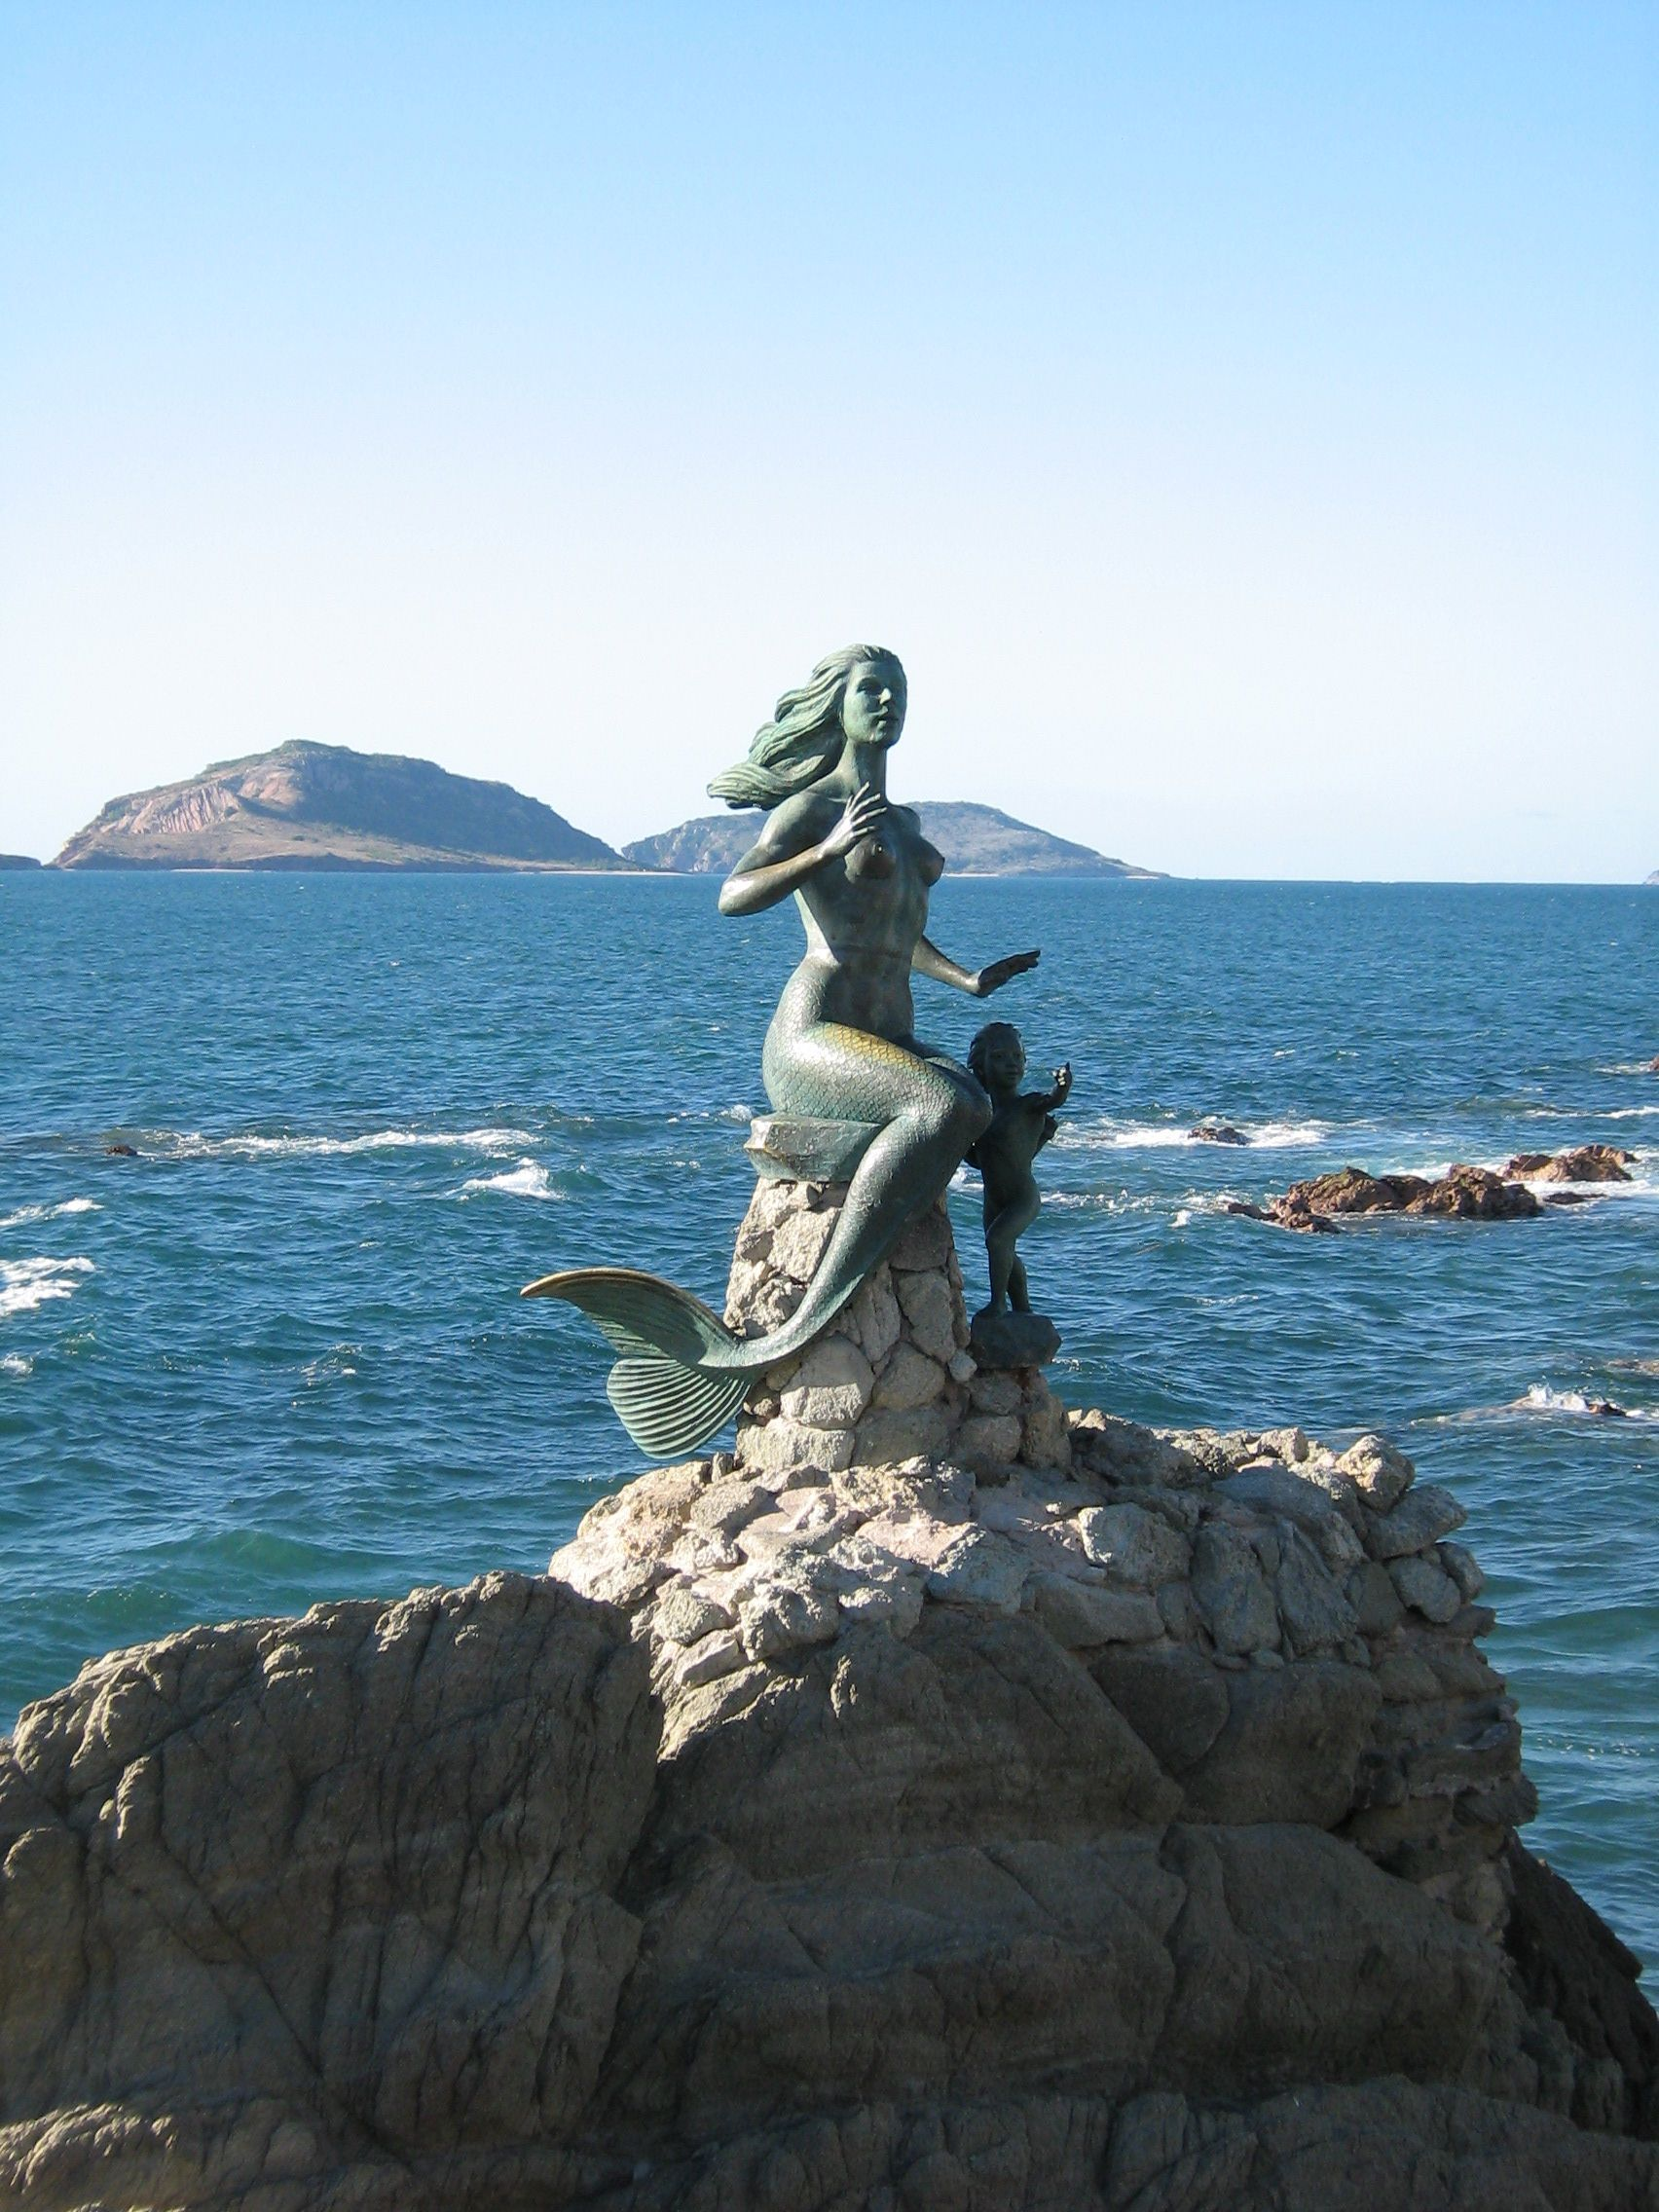 mermaid statue in turkey the most famous little mermaid statue in